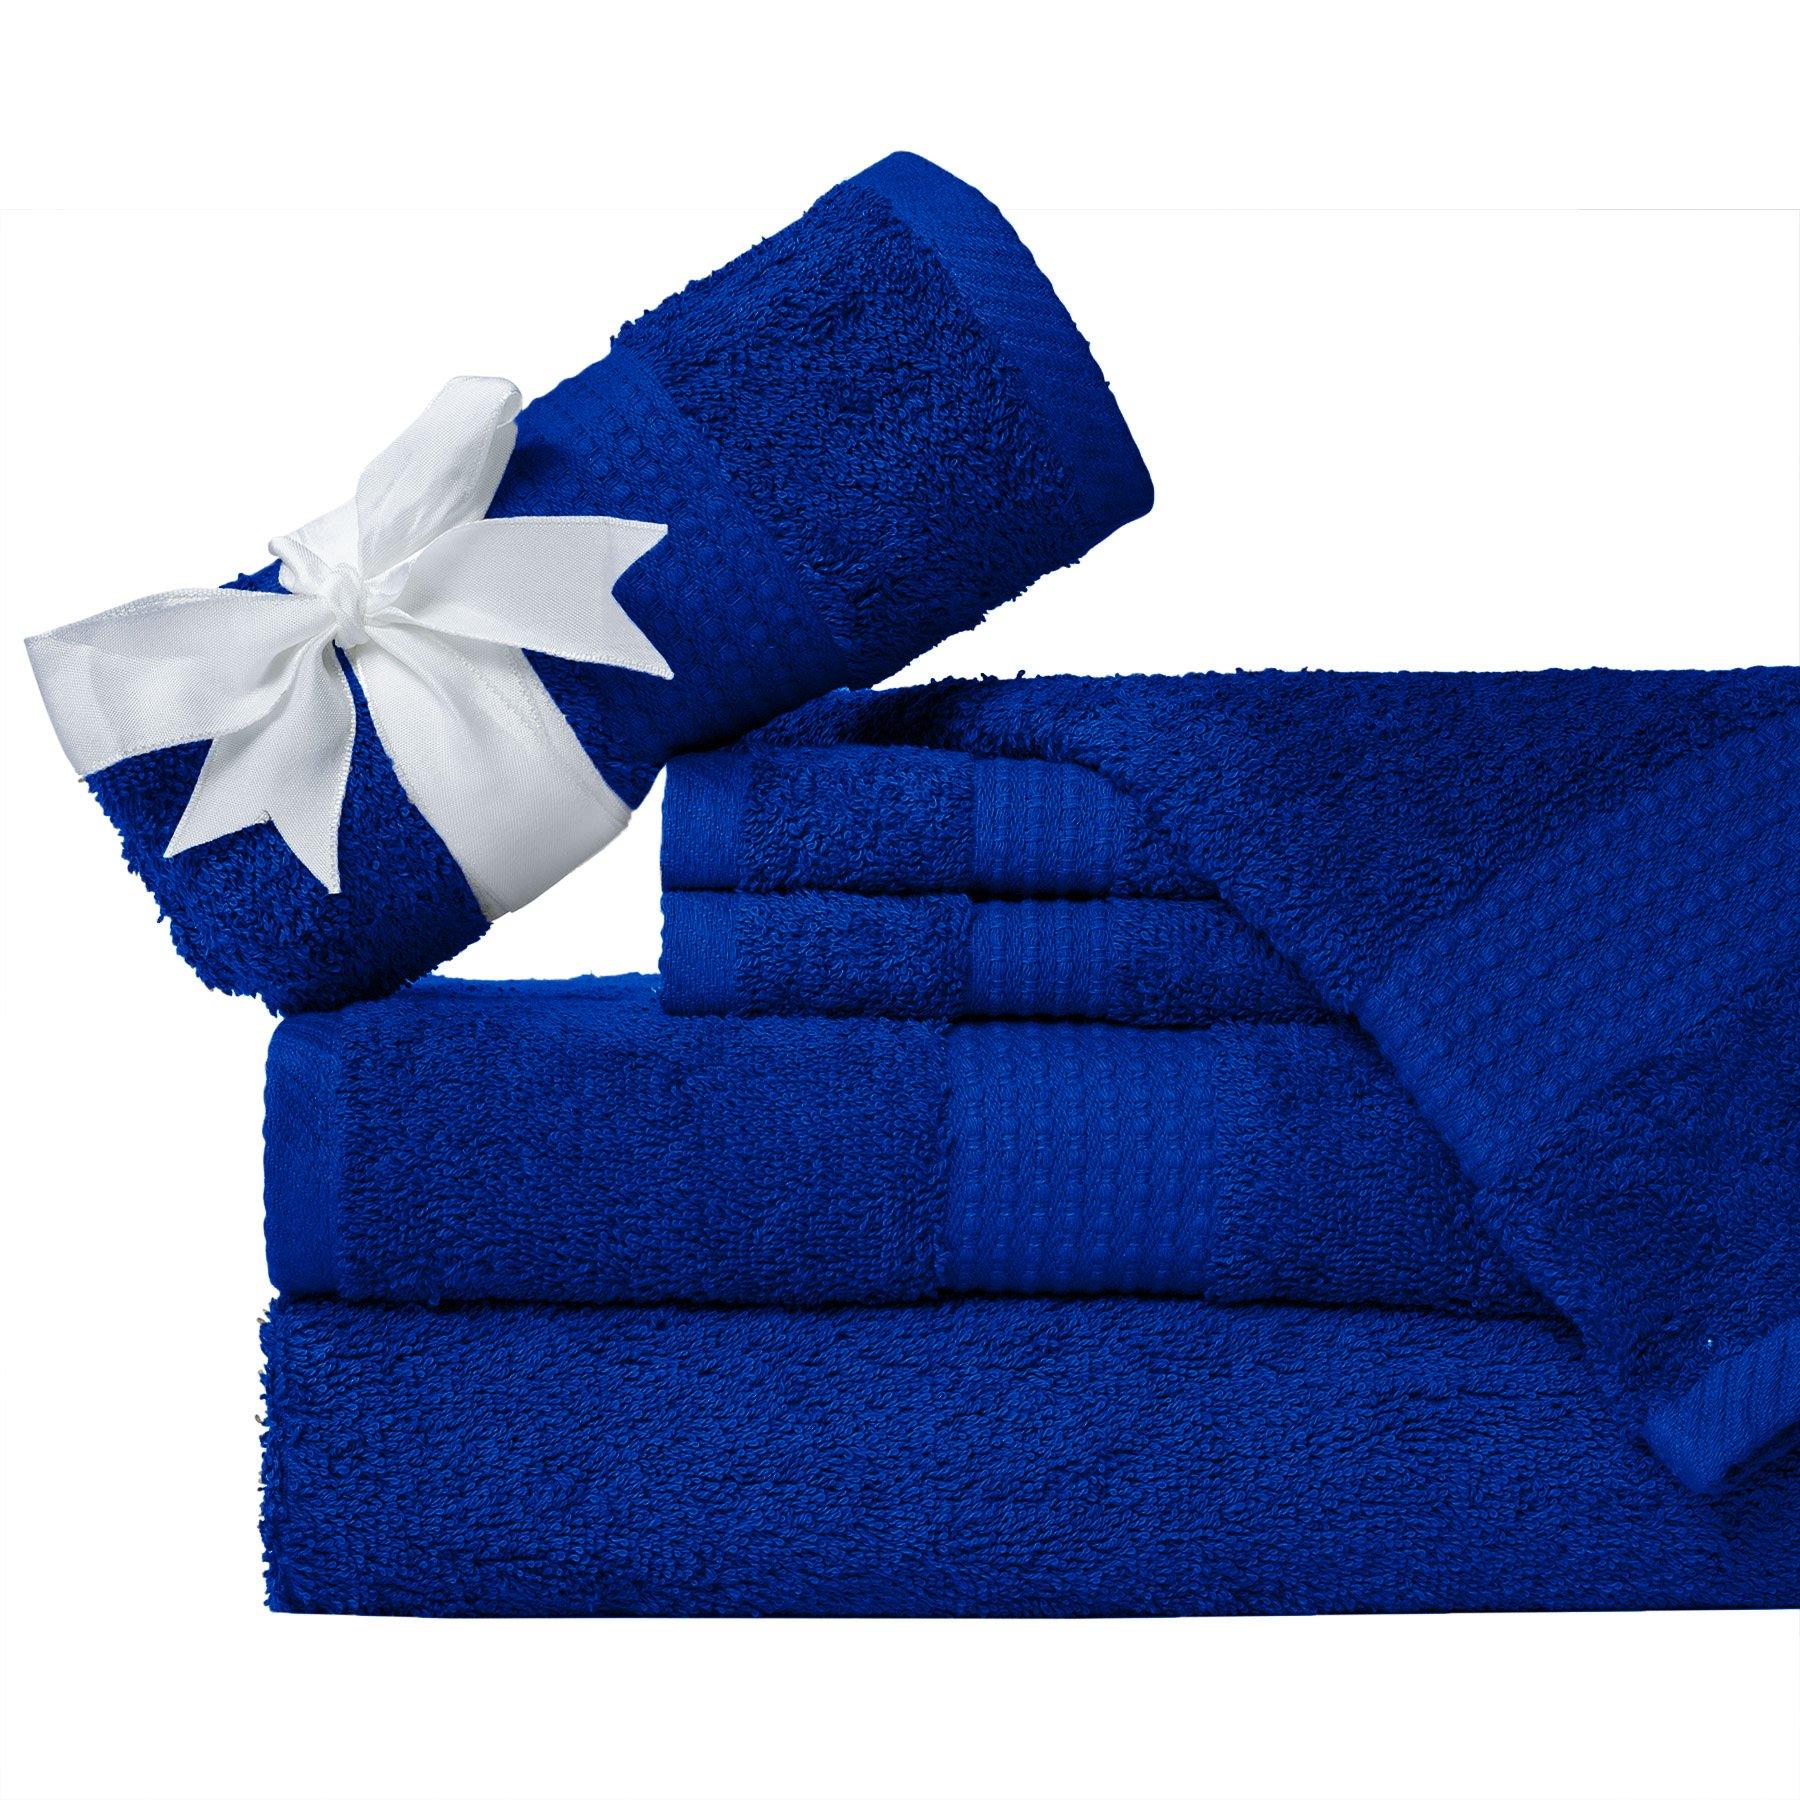 "Weavely Supersoft 100% Superior Cotton 6 Piece Bath Towel Set, Hotel & Spa QualityTowel, 2 x Bath Towels 30""X56"", 2 x Hand Towels 16""X28"", 2 x Wash Cloths 13""x13"" - Blue"